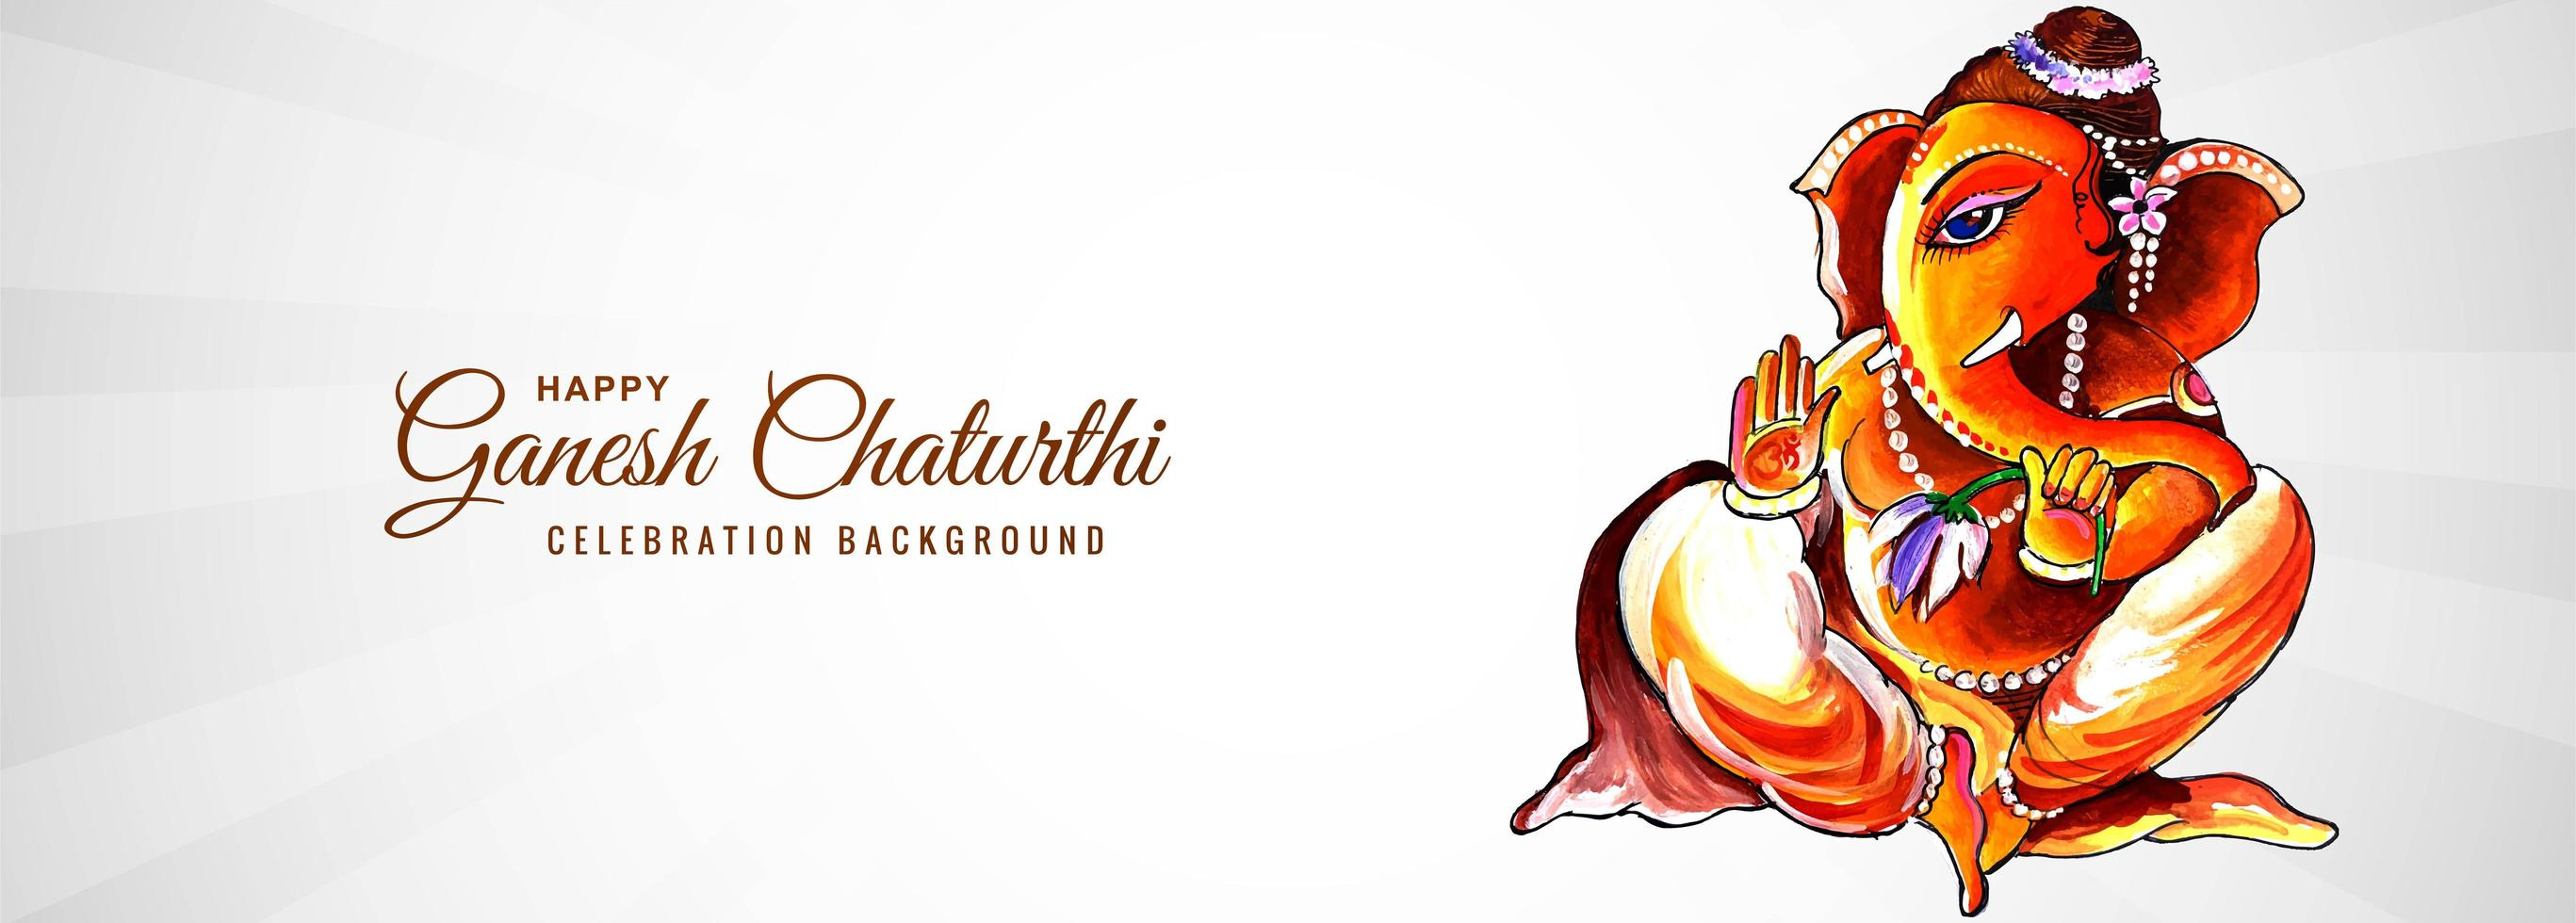 oranje aquarel lord ganesh voor ganesh chaturthi banner vector